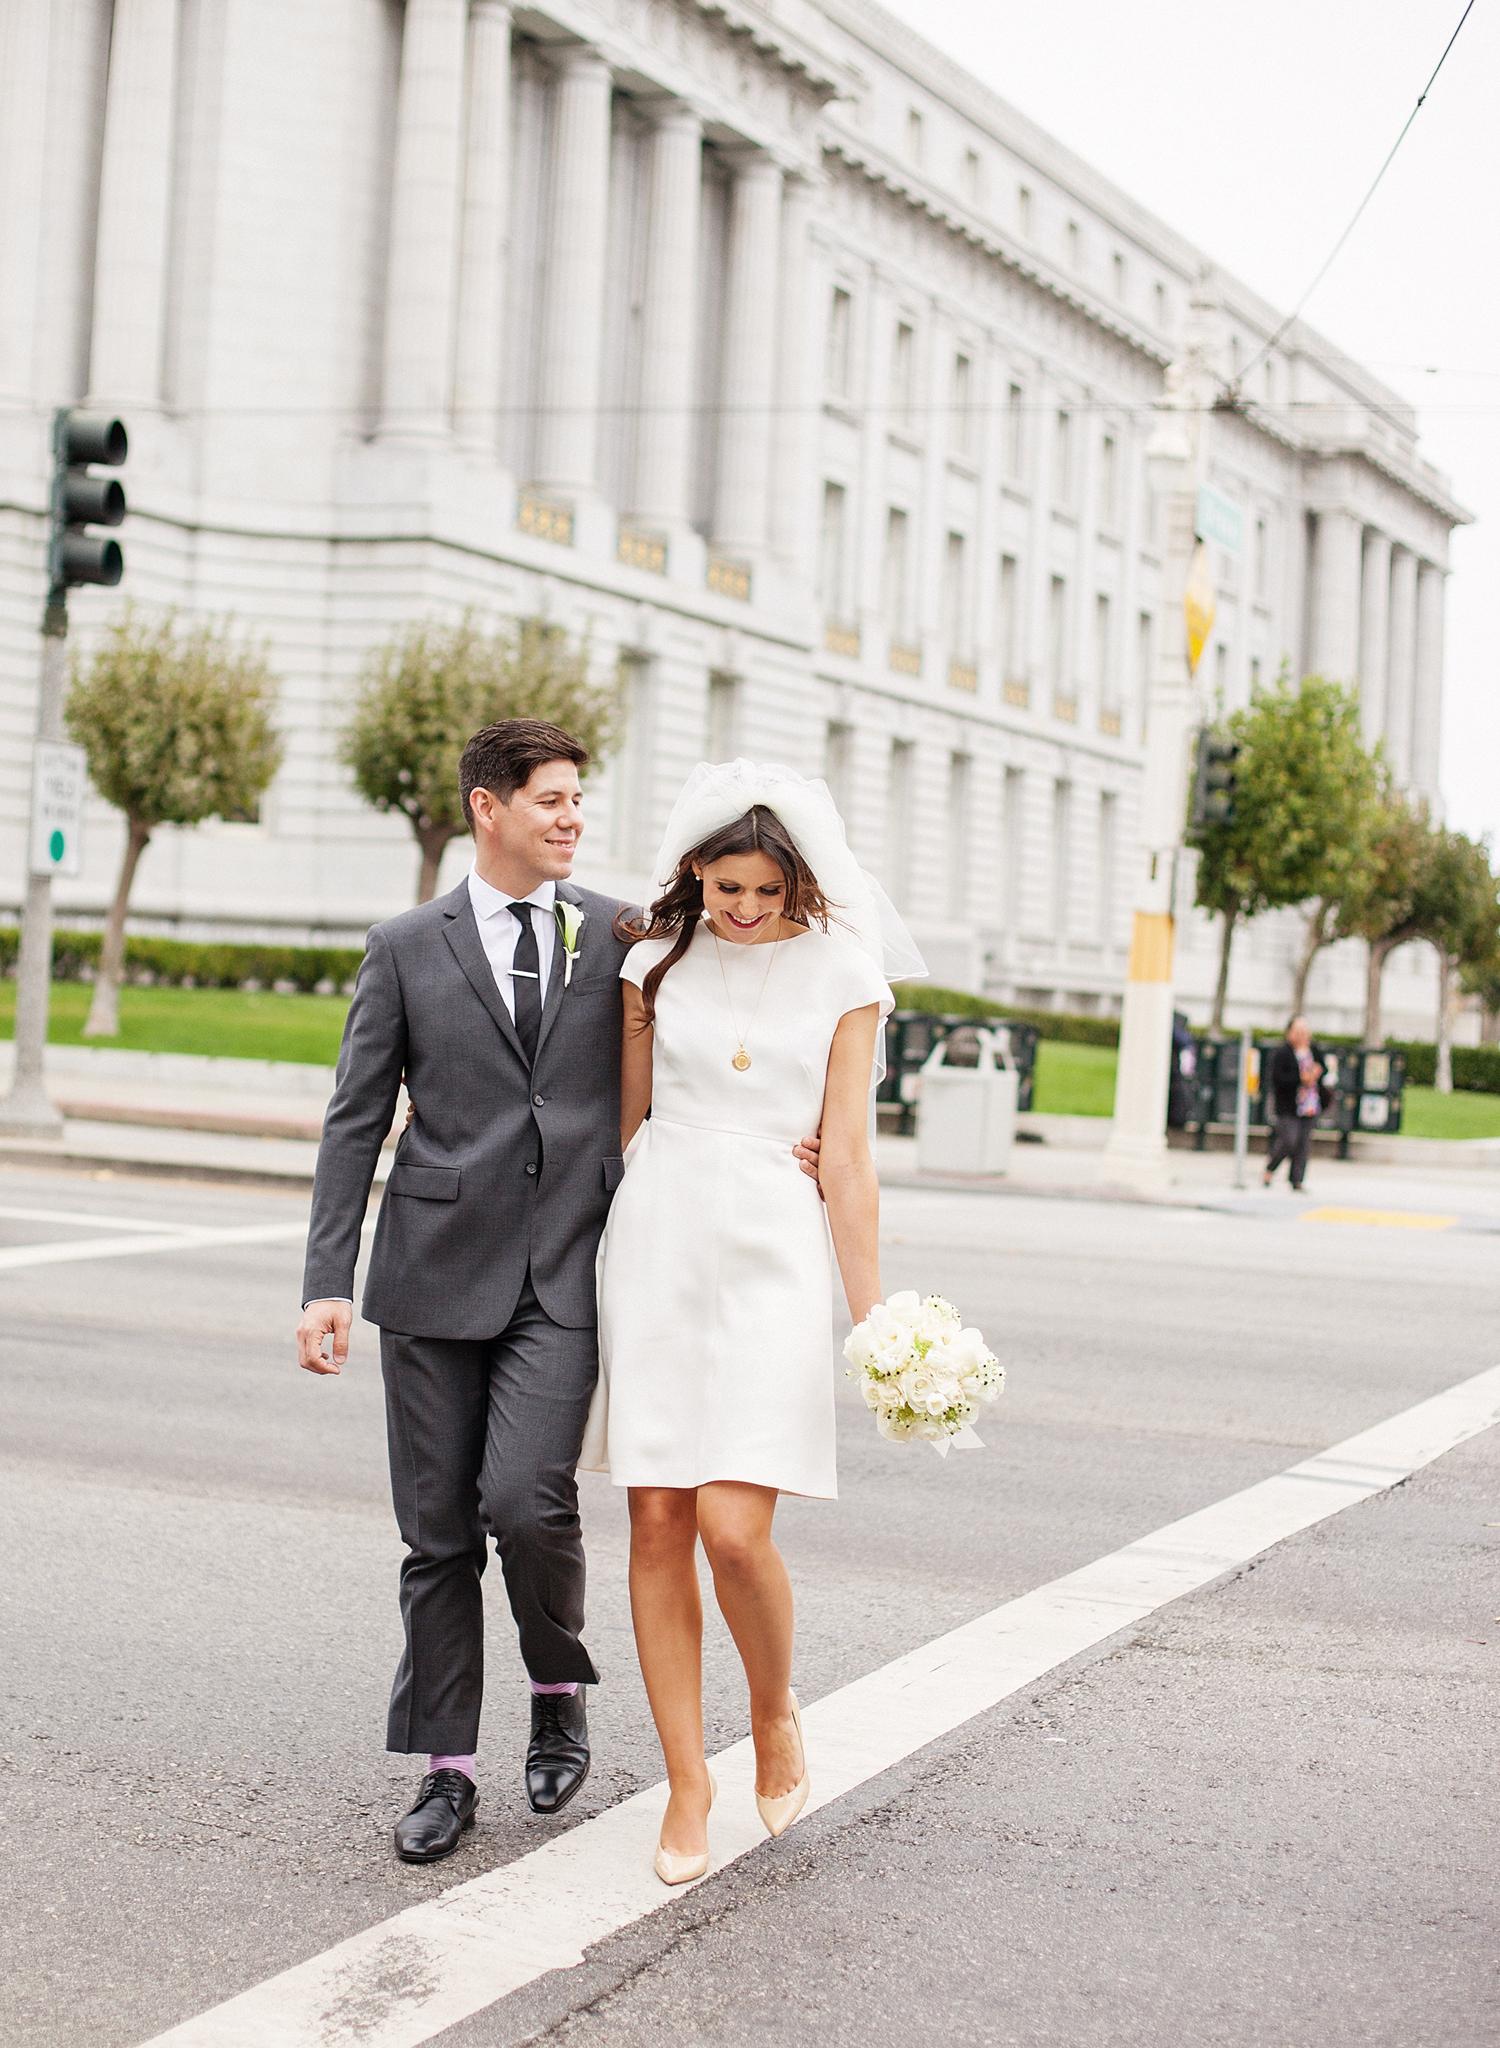 44-jackie-o-look-alike-wedding.jpg